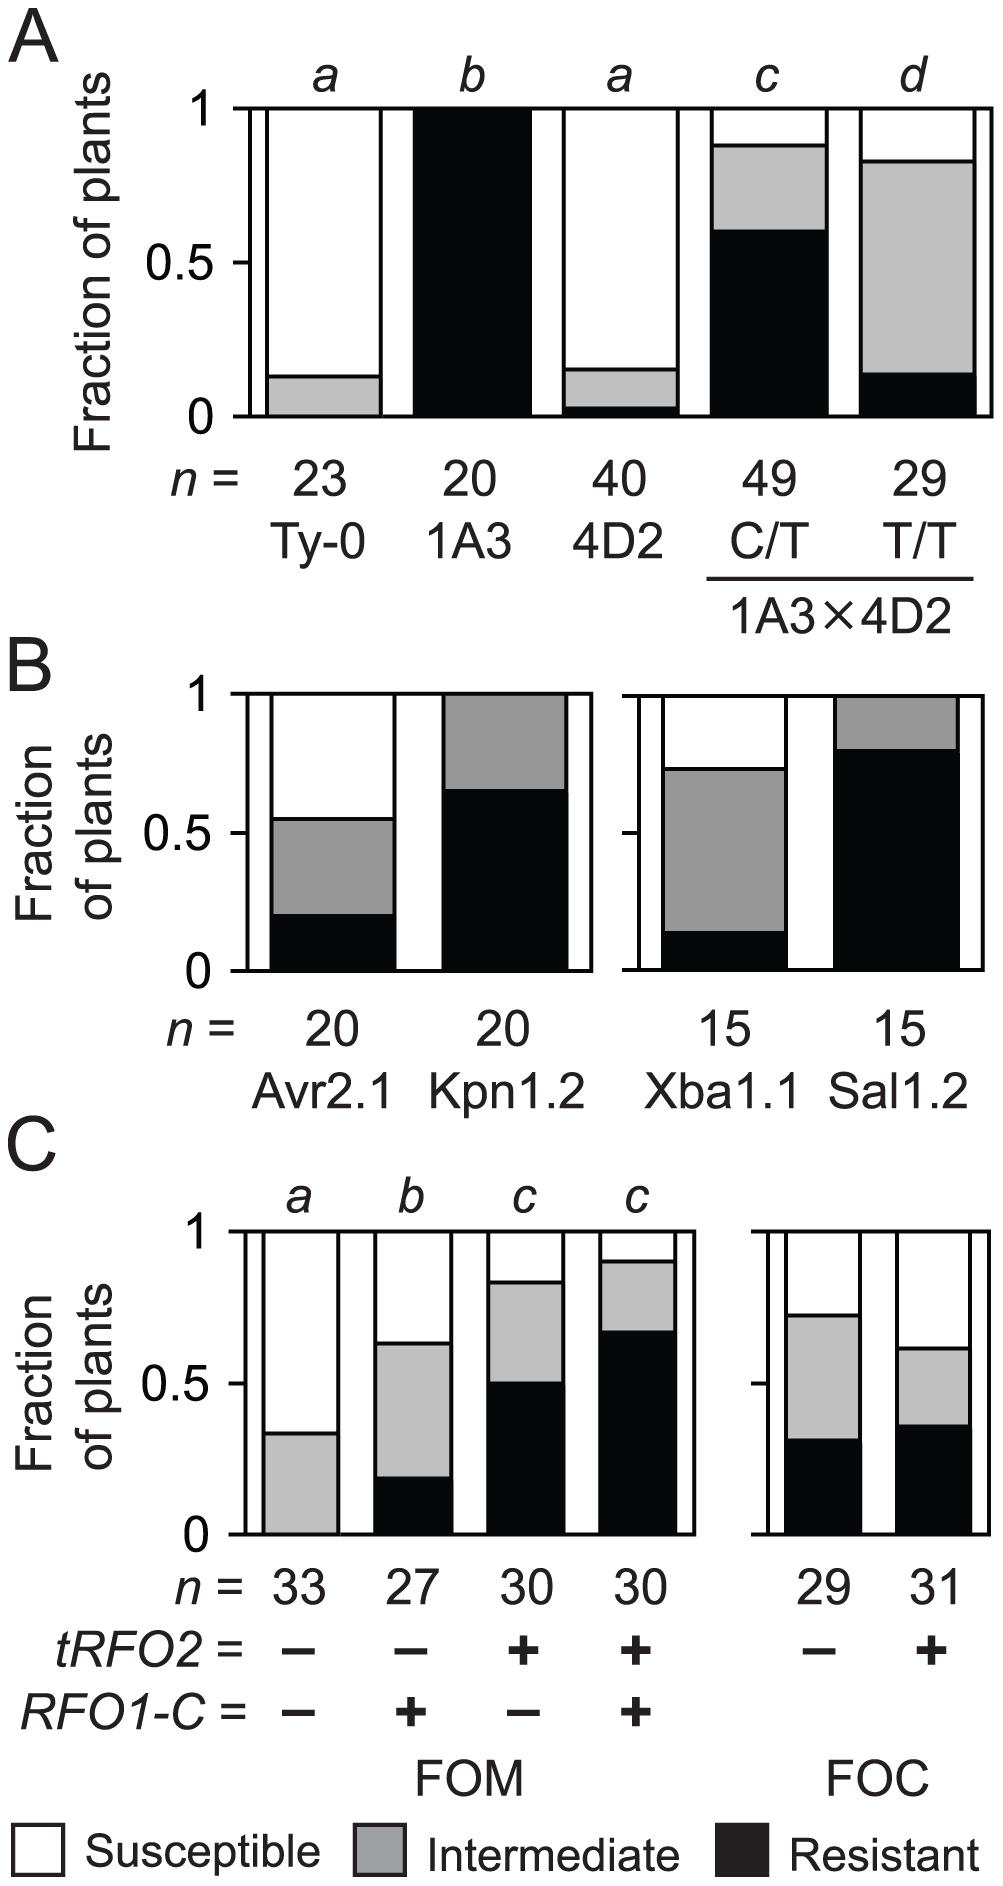 Resistance of endogenous and transgenic <i>RFO2</i>.